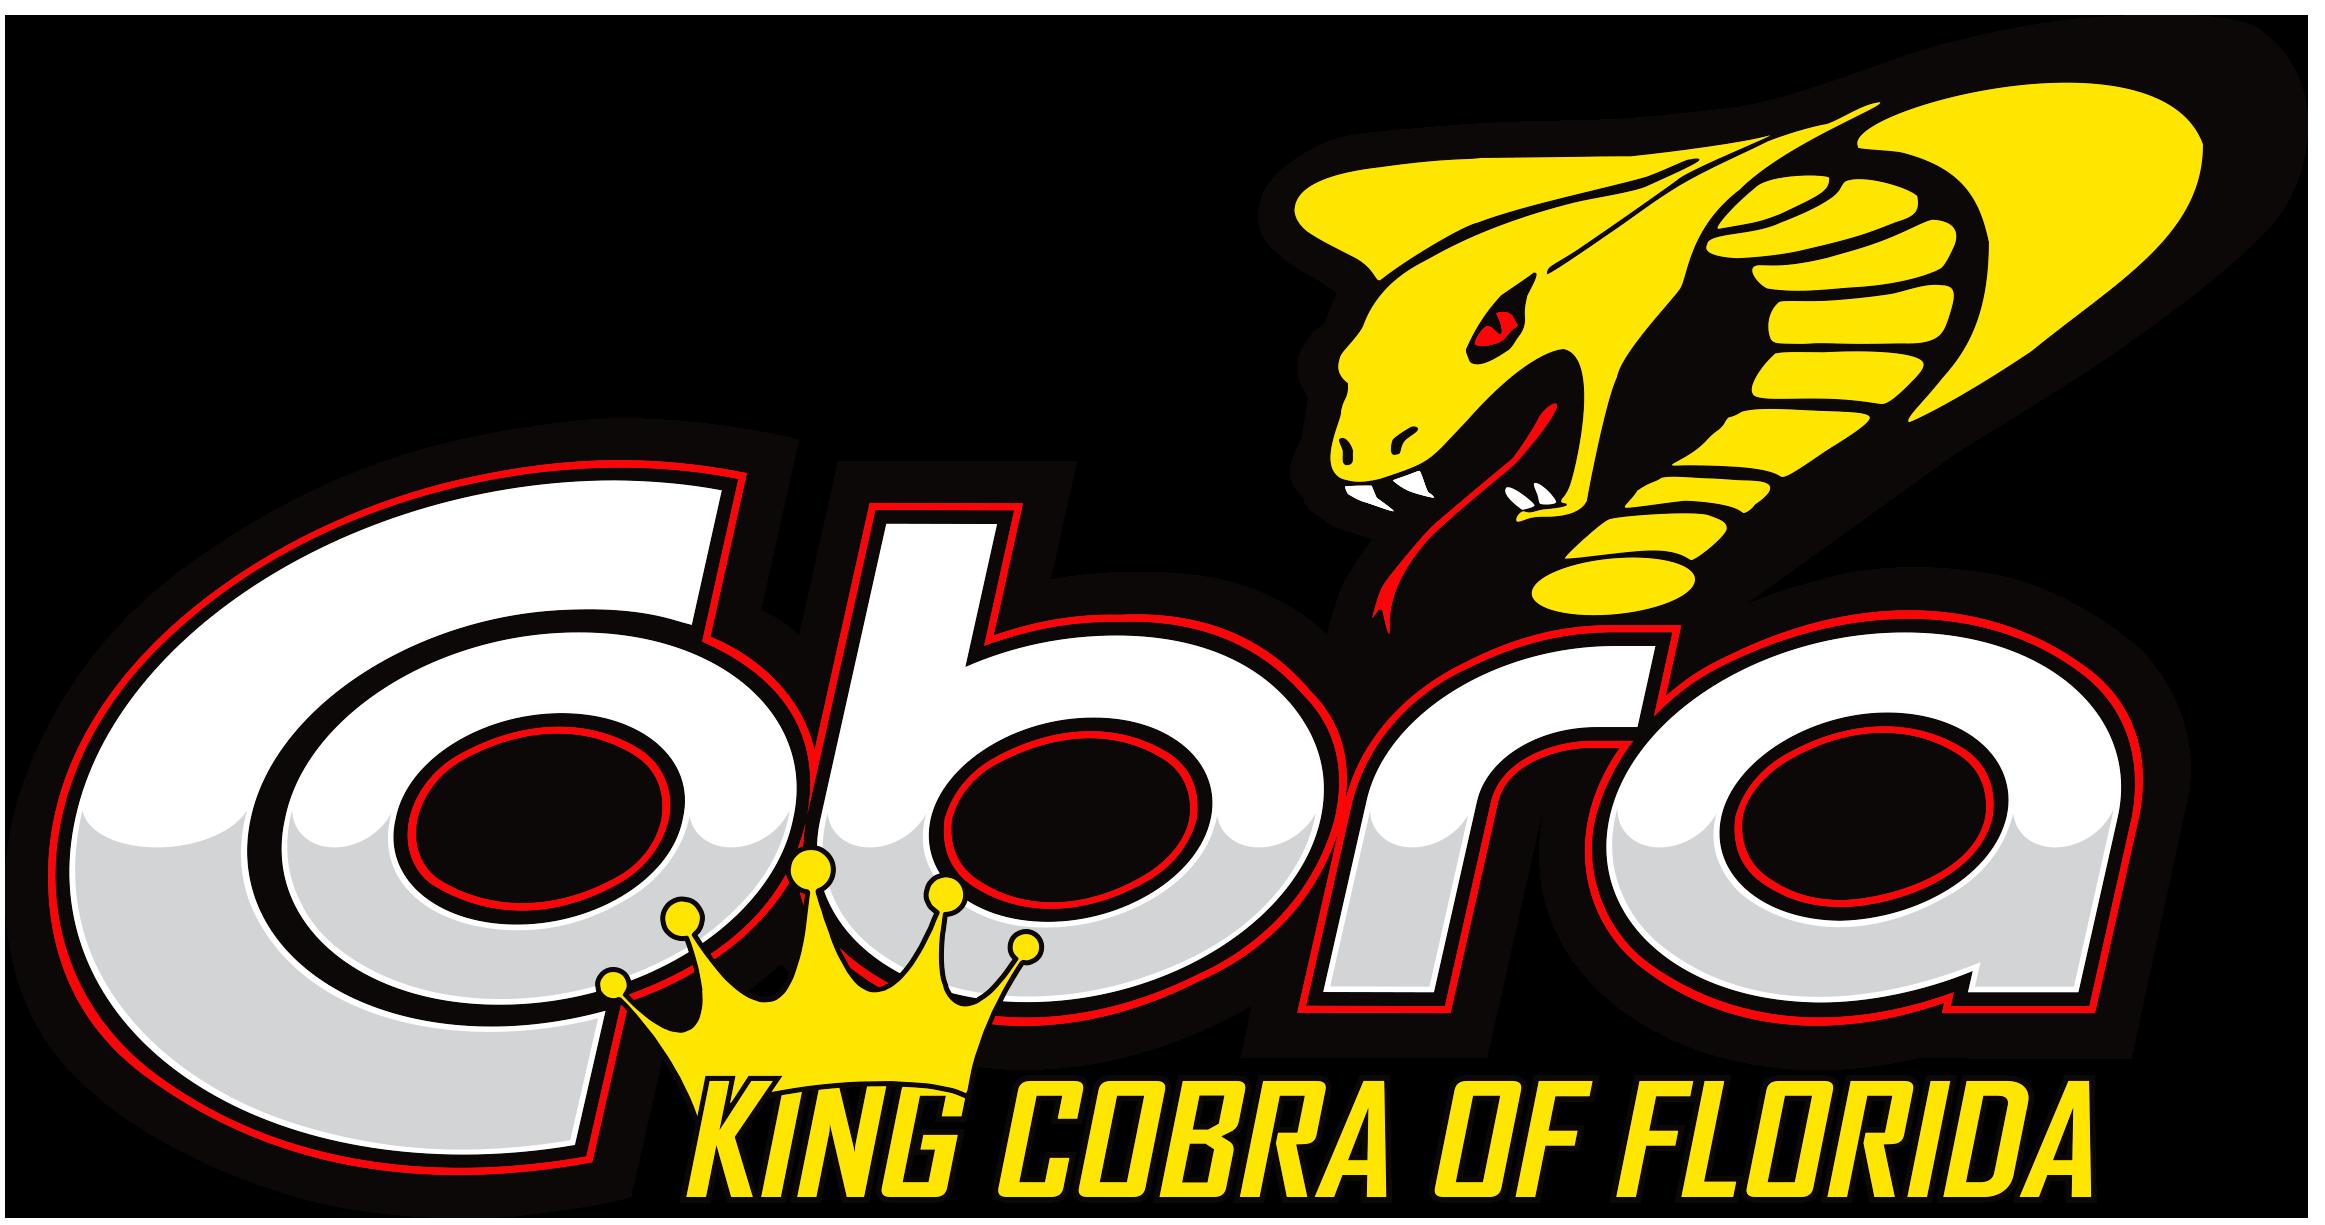 Cobra clipart king cobra. Kingcobra png go back